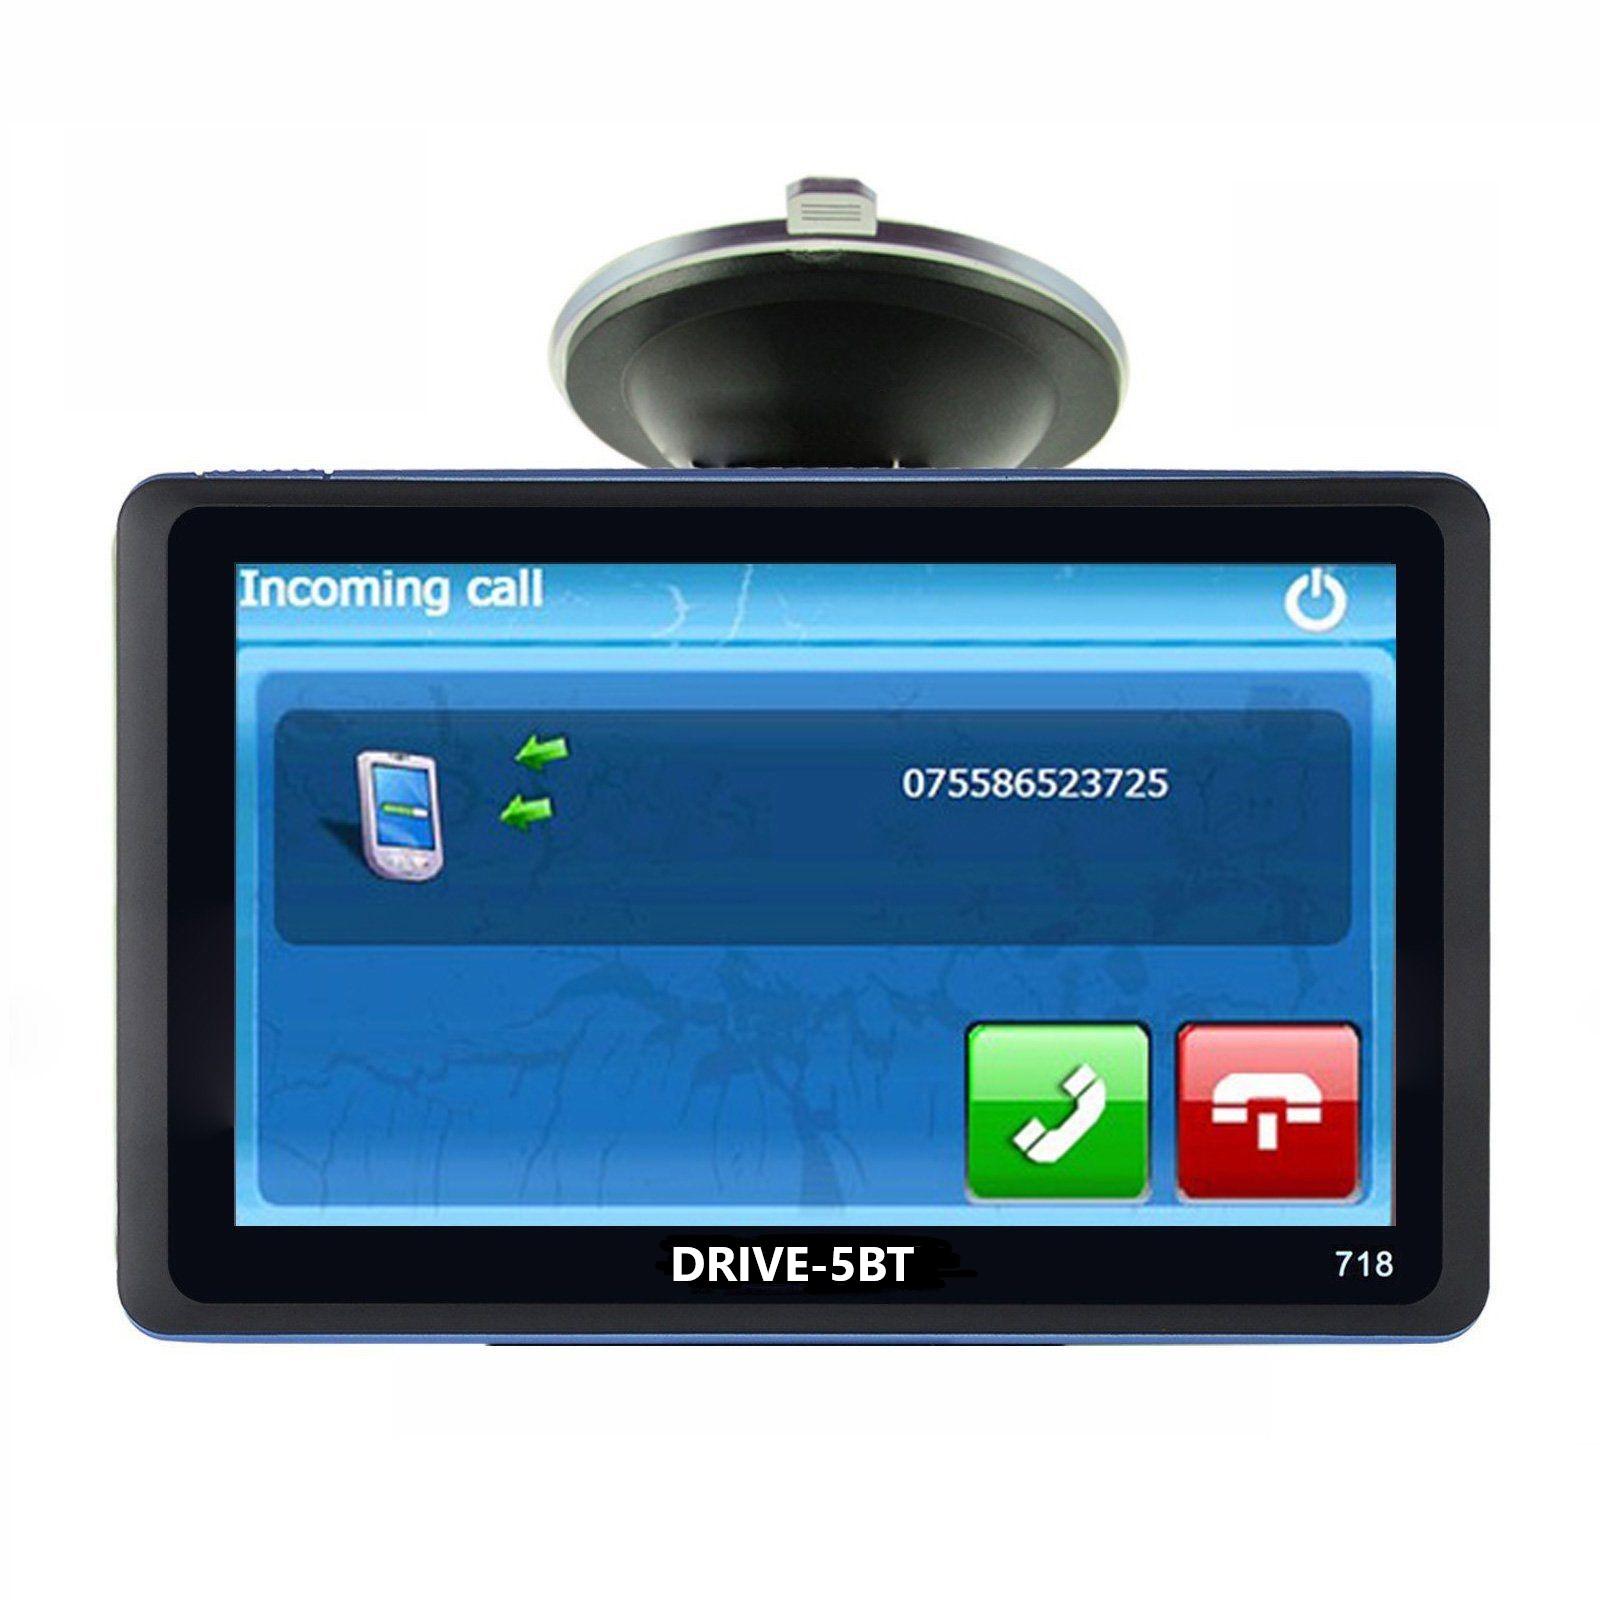 5  Zoll GPS Navigationssystem DRIVE-5BT  Für LKW, PKW,  WOMO. INKL Rückfahrkamera